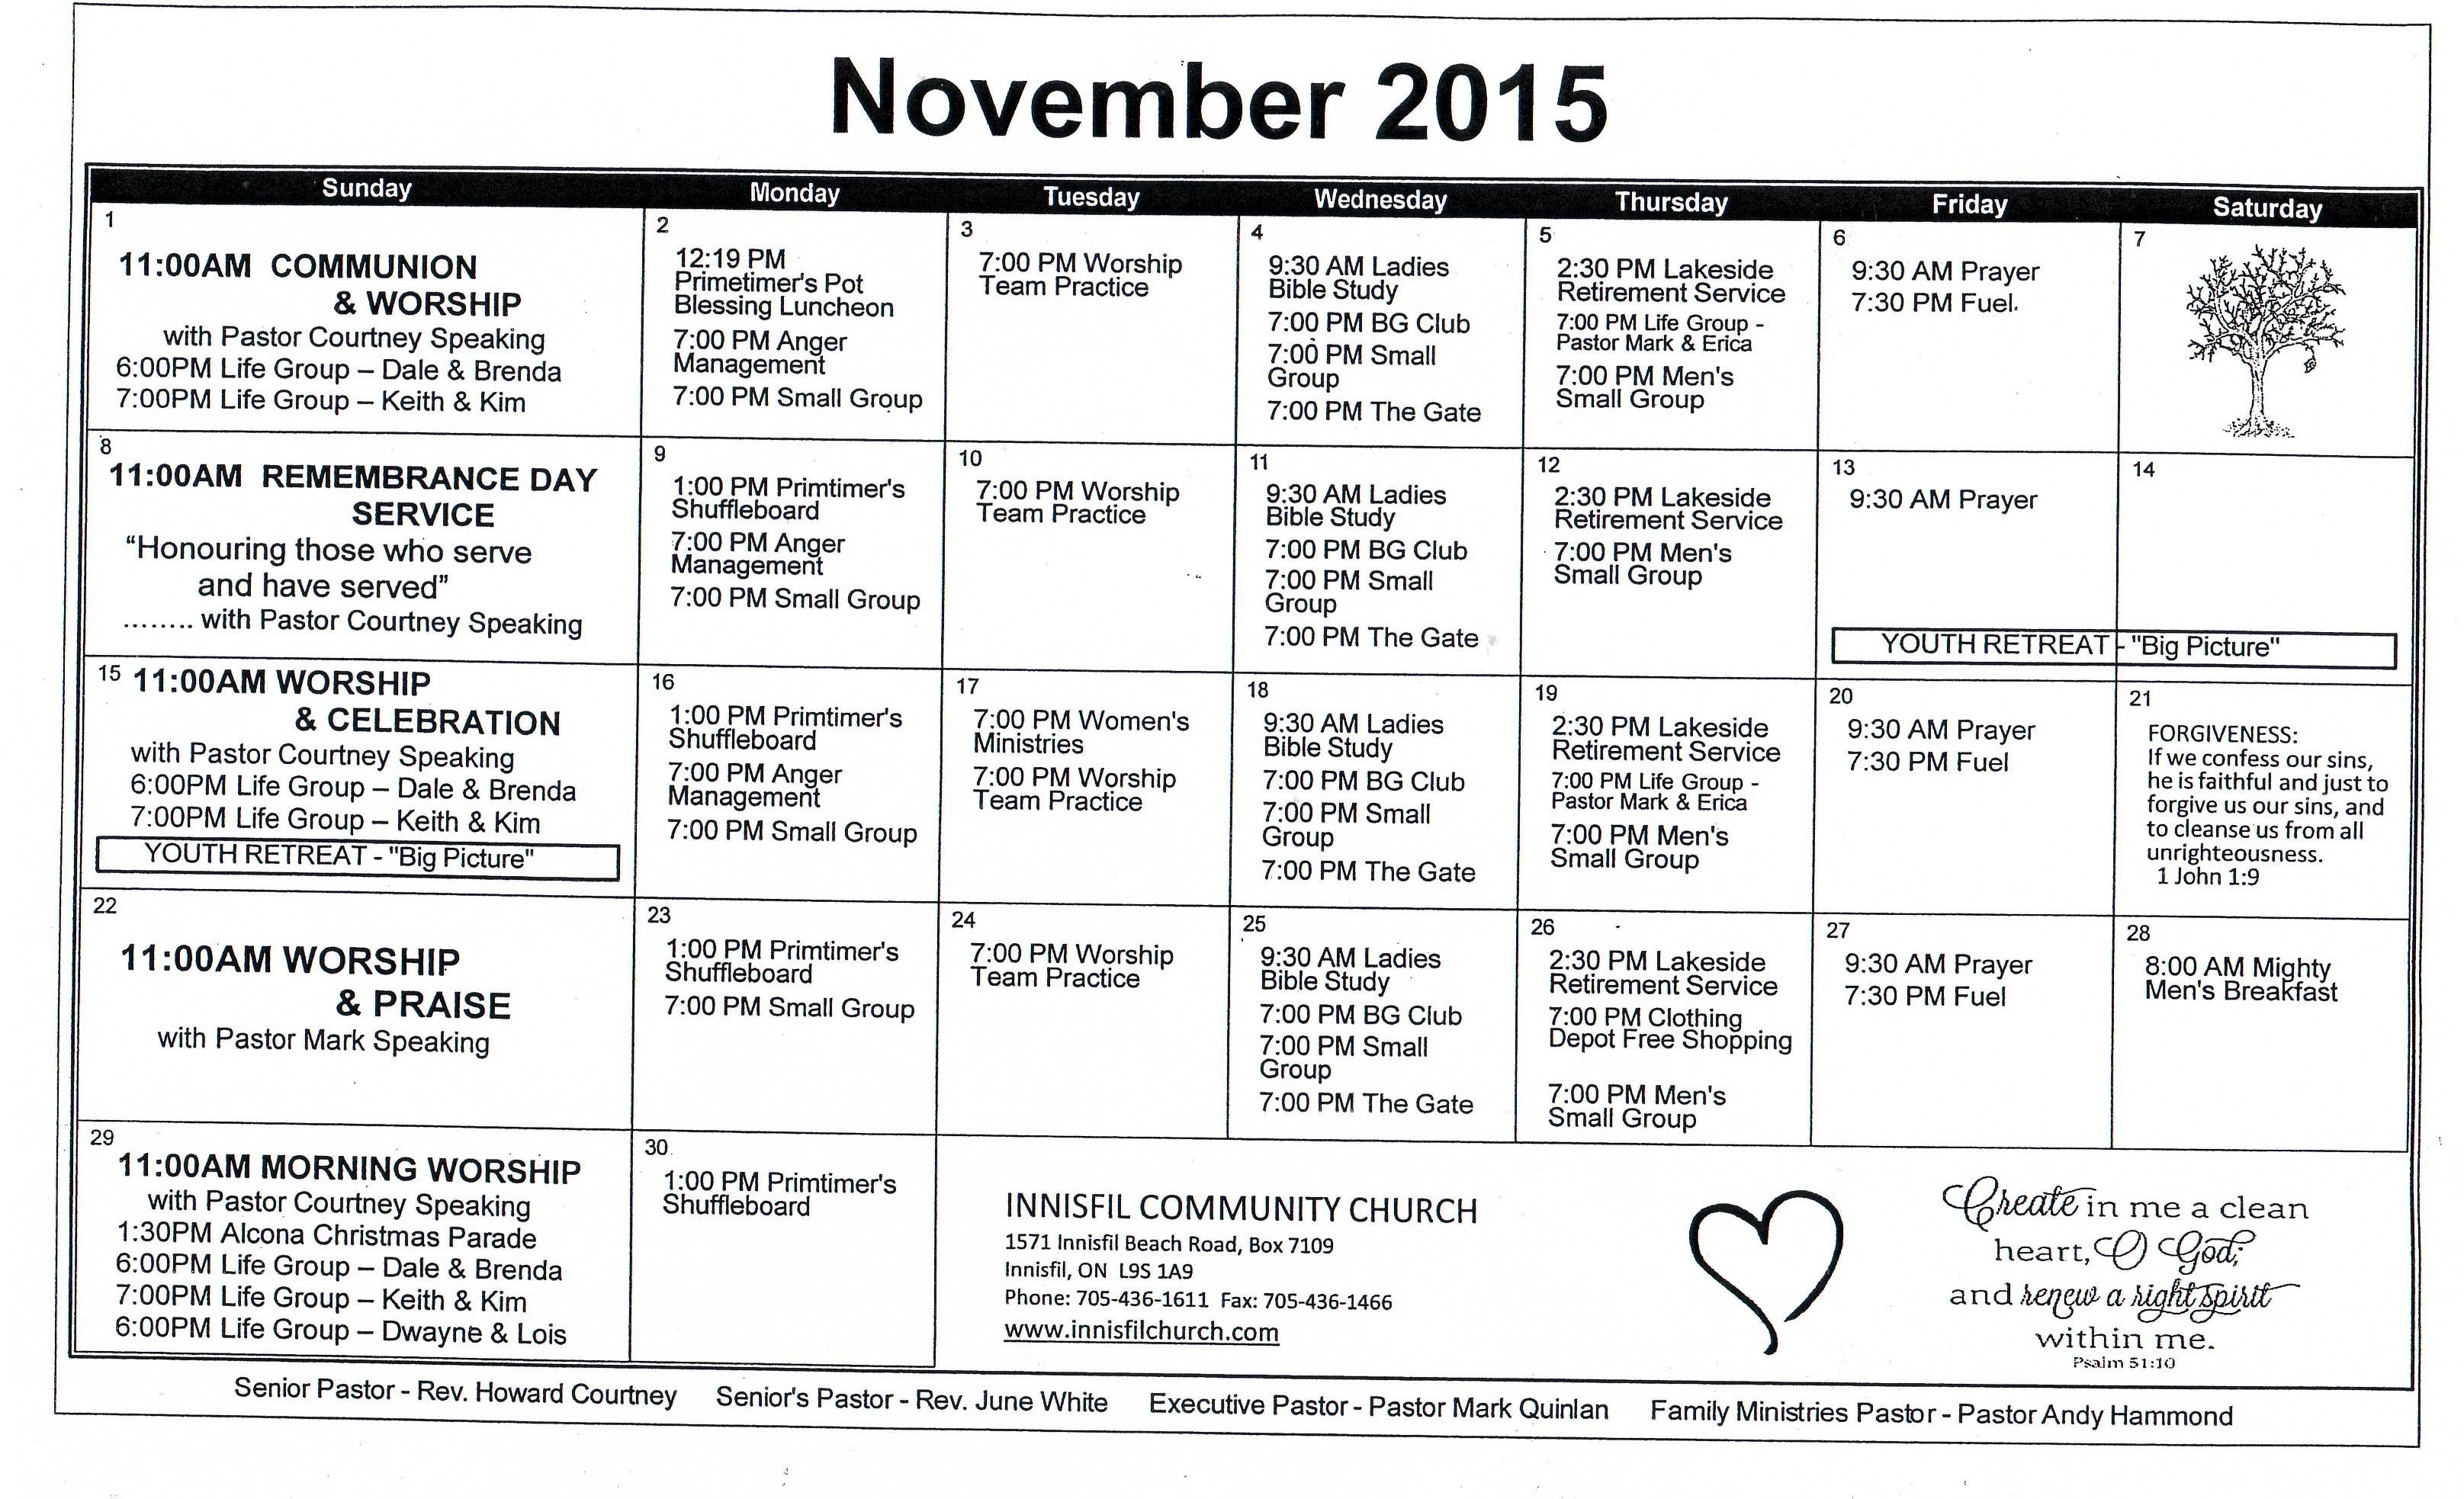 Innisfil Community Church / Calendar / Monthly Calendar